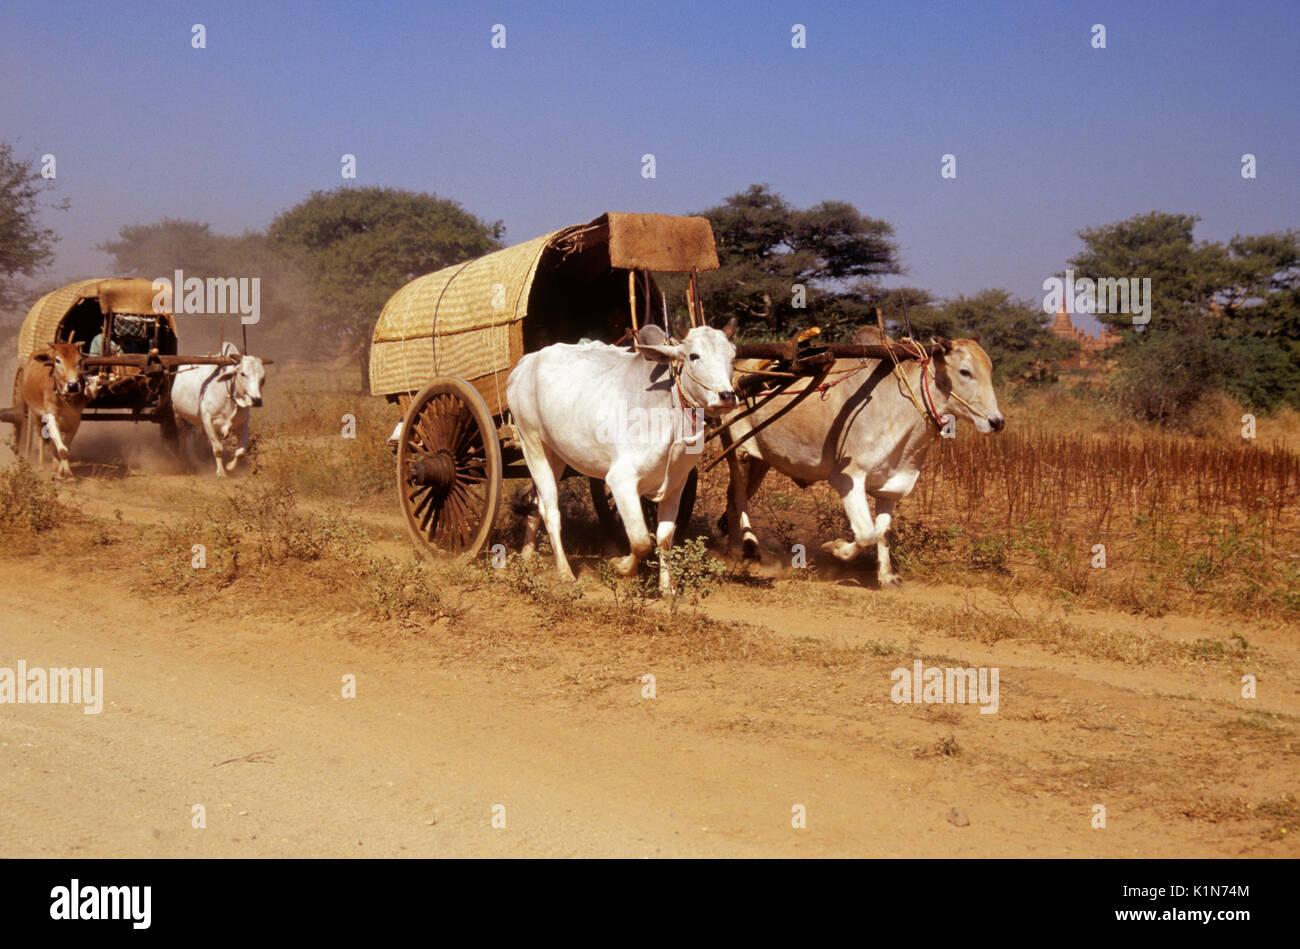 Bullock carts on dusty track, Pagan (Bagan), Burma (Myanmar) - Stock Image